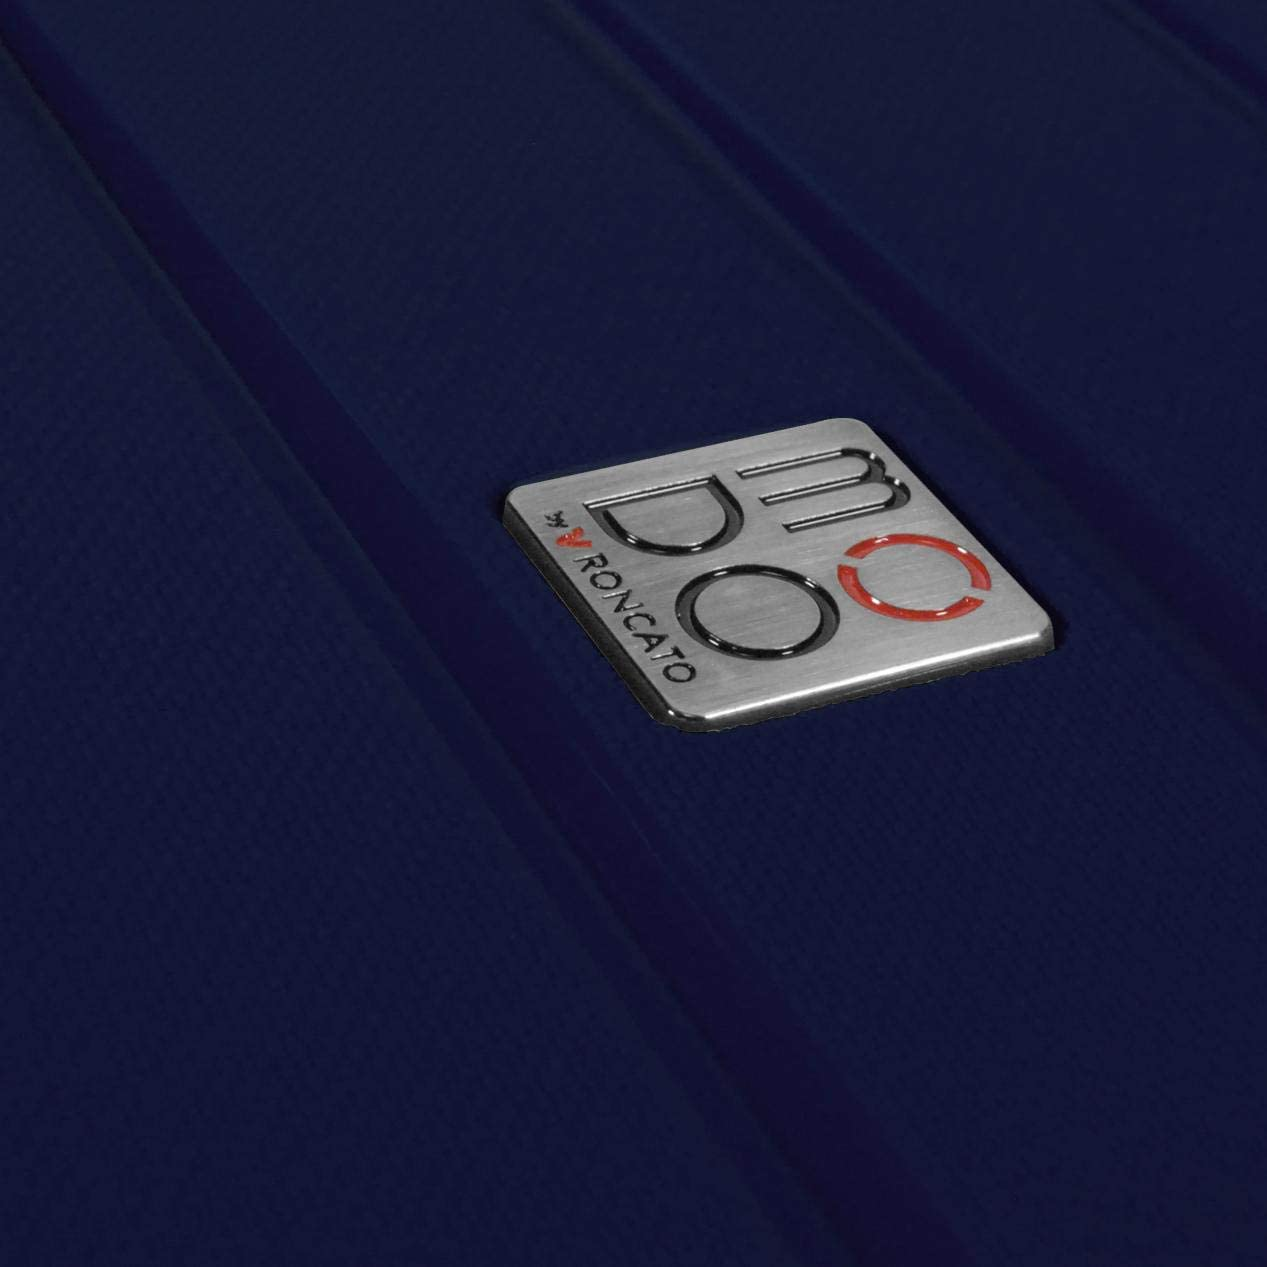 Starlight 2.0 Equipaje de Mano BLU Notte Azul 40 Liters